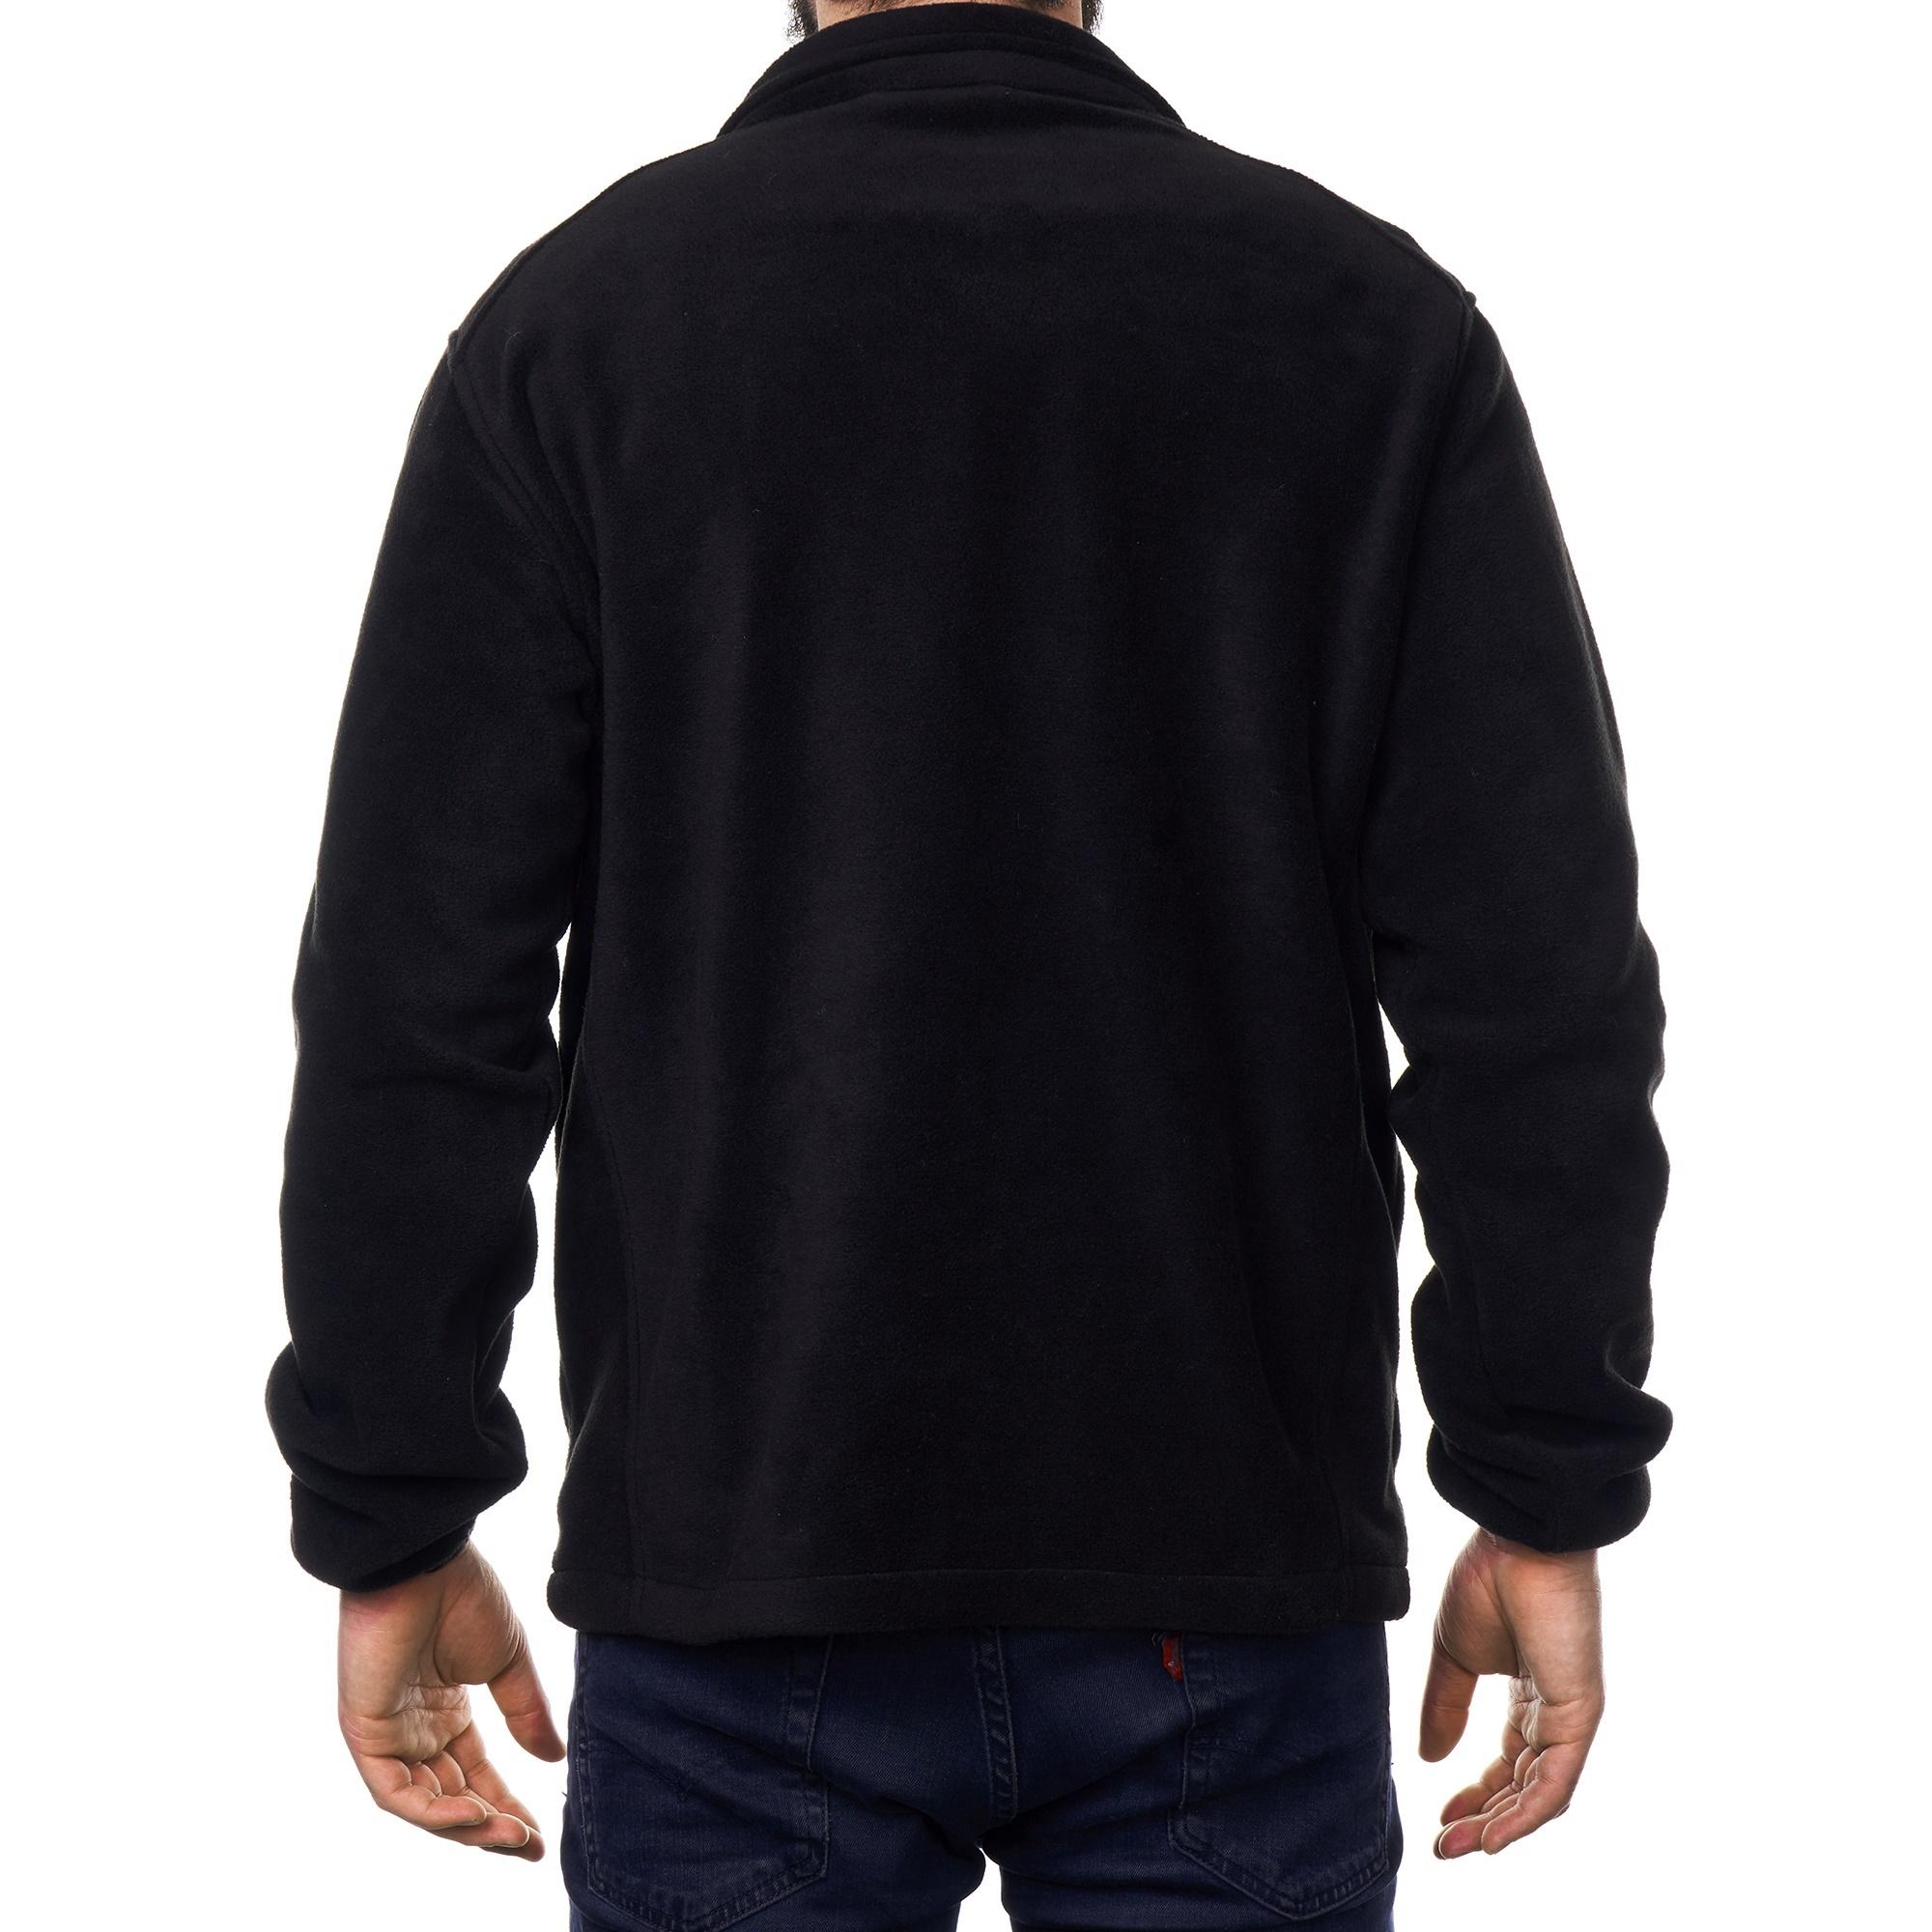 Alpine-Swiss-Trent-Mens-Full-Zip-Up-Fleece-Jacket-Soft-Casual-Warm-Zipper-Coat thumbnail 17